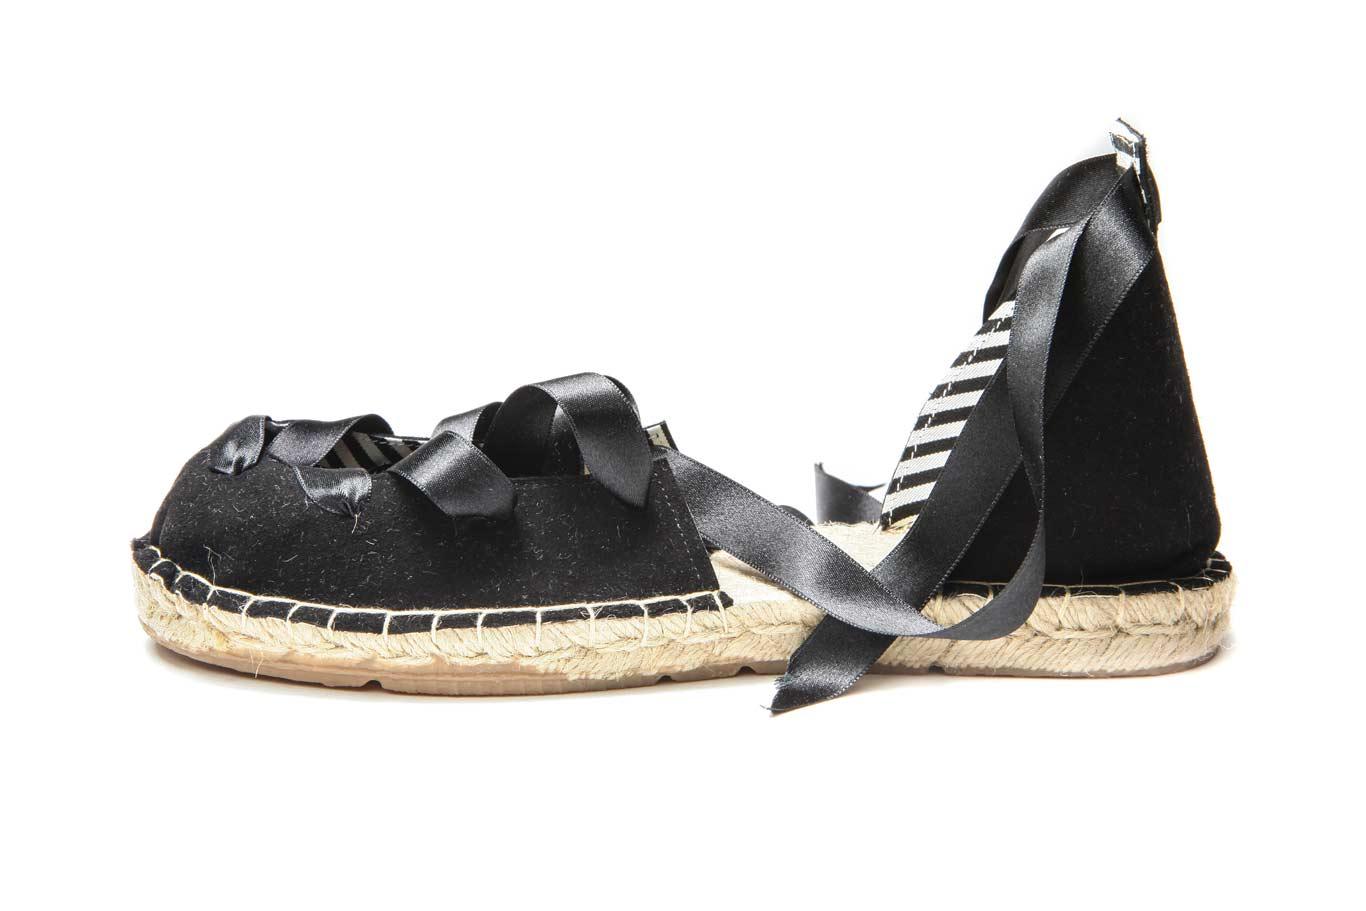 Black leather espadrilles   Handmade